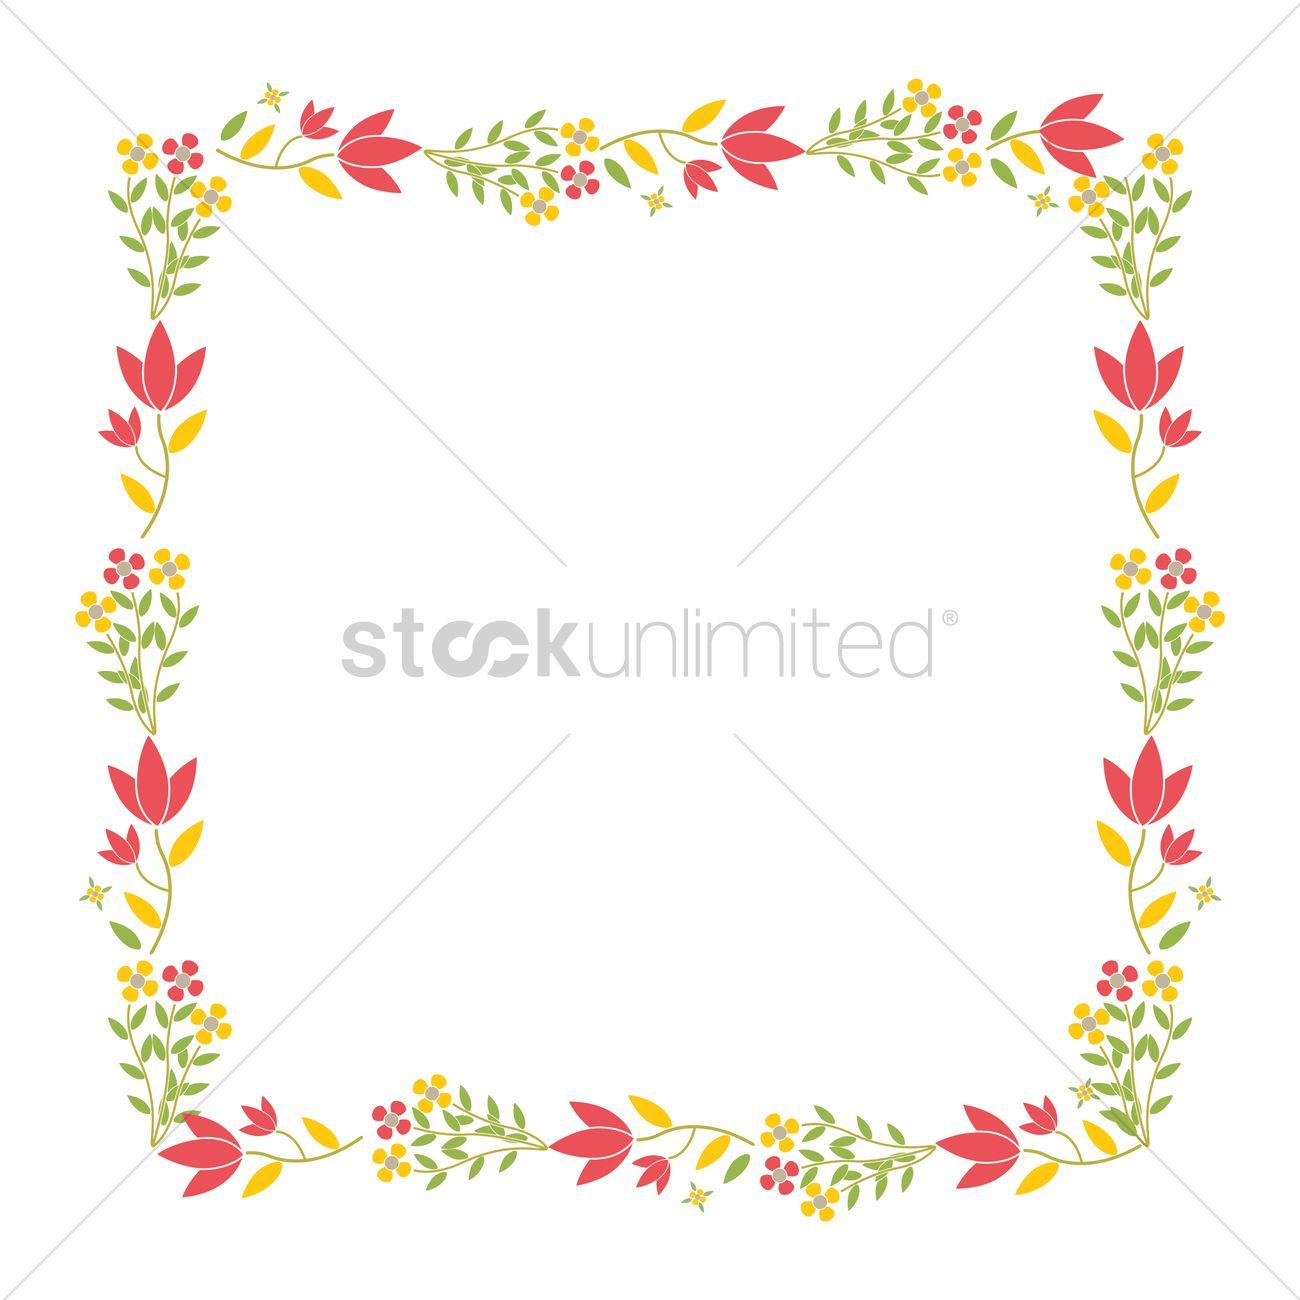 Flower Border Images Stock Photos amp Vectors  Shutterstock